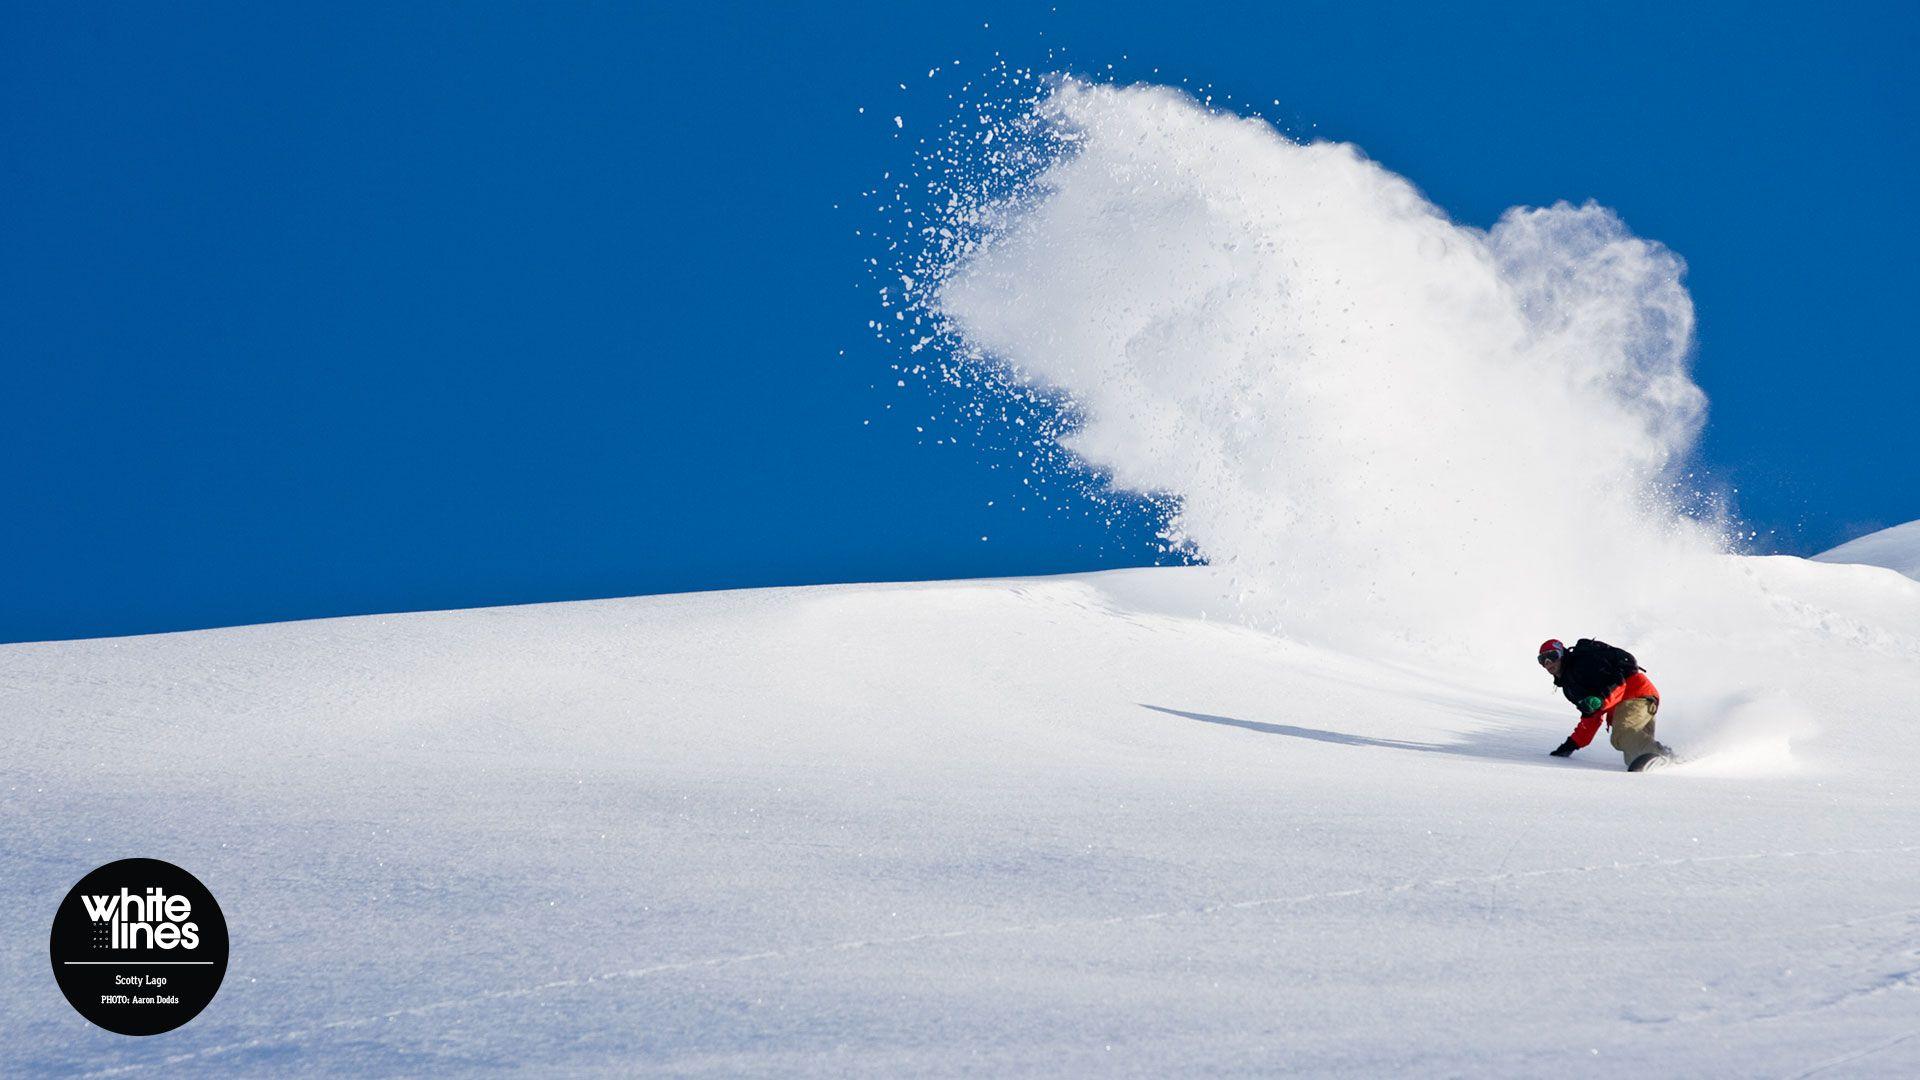 Scotty Lago Snowboarding Snowboard Skiing Giant Wall Art Poster Print